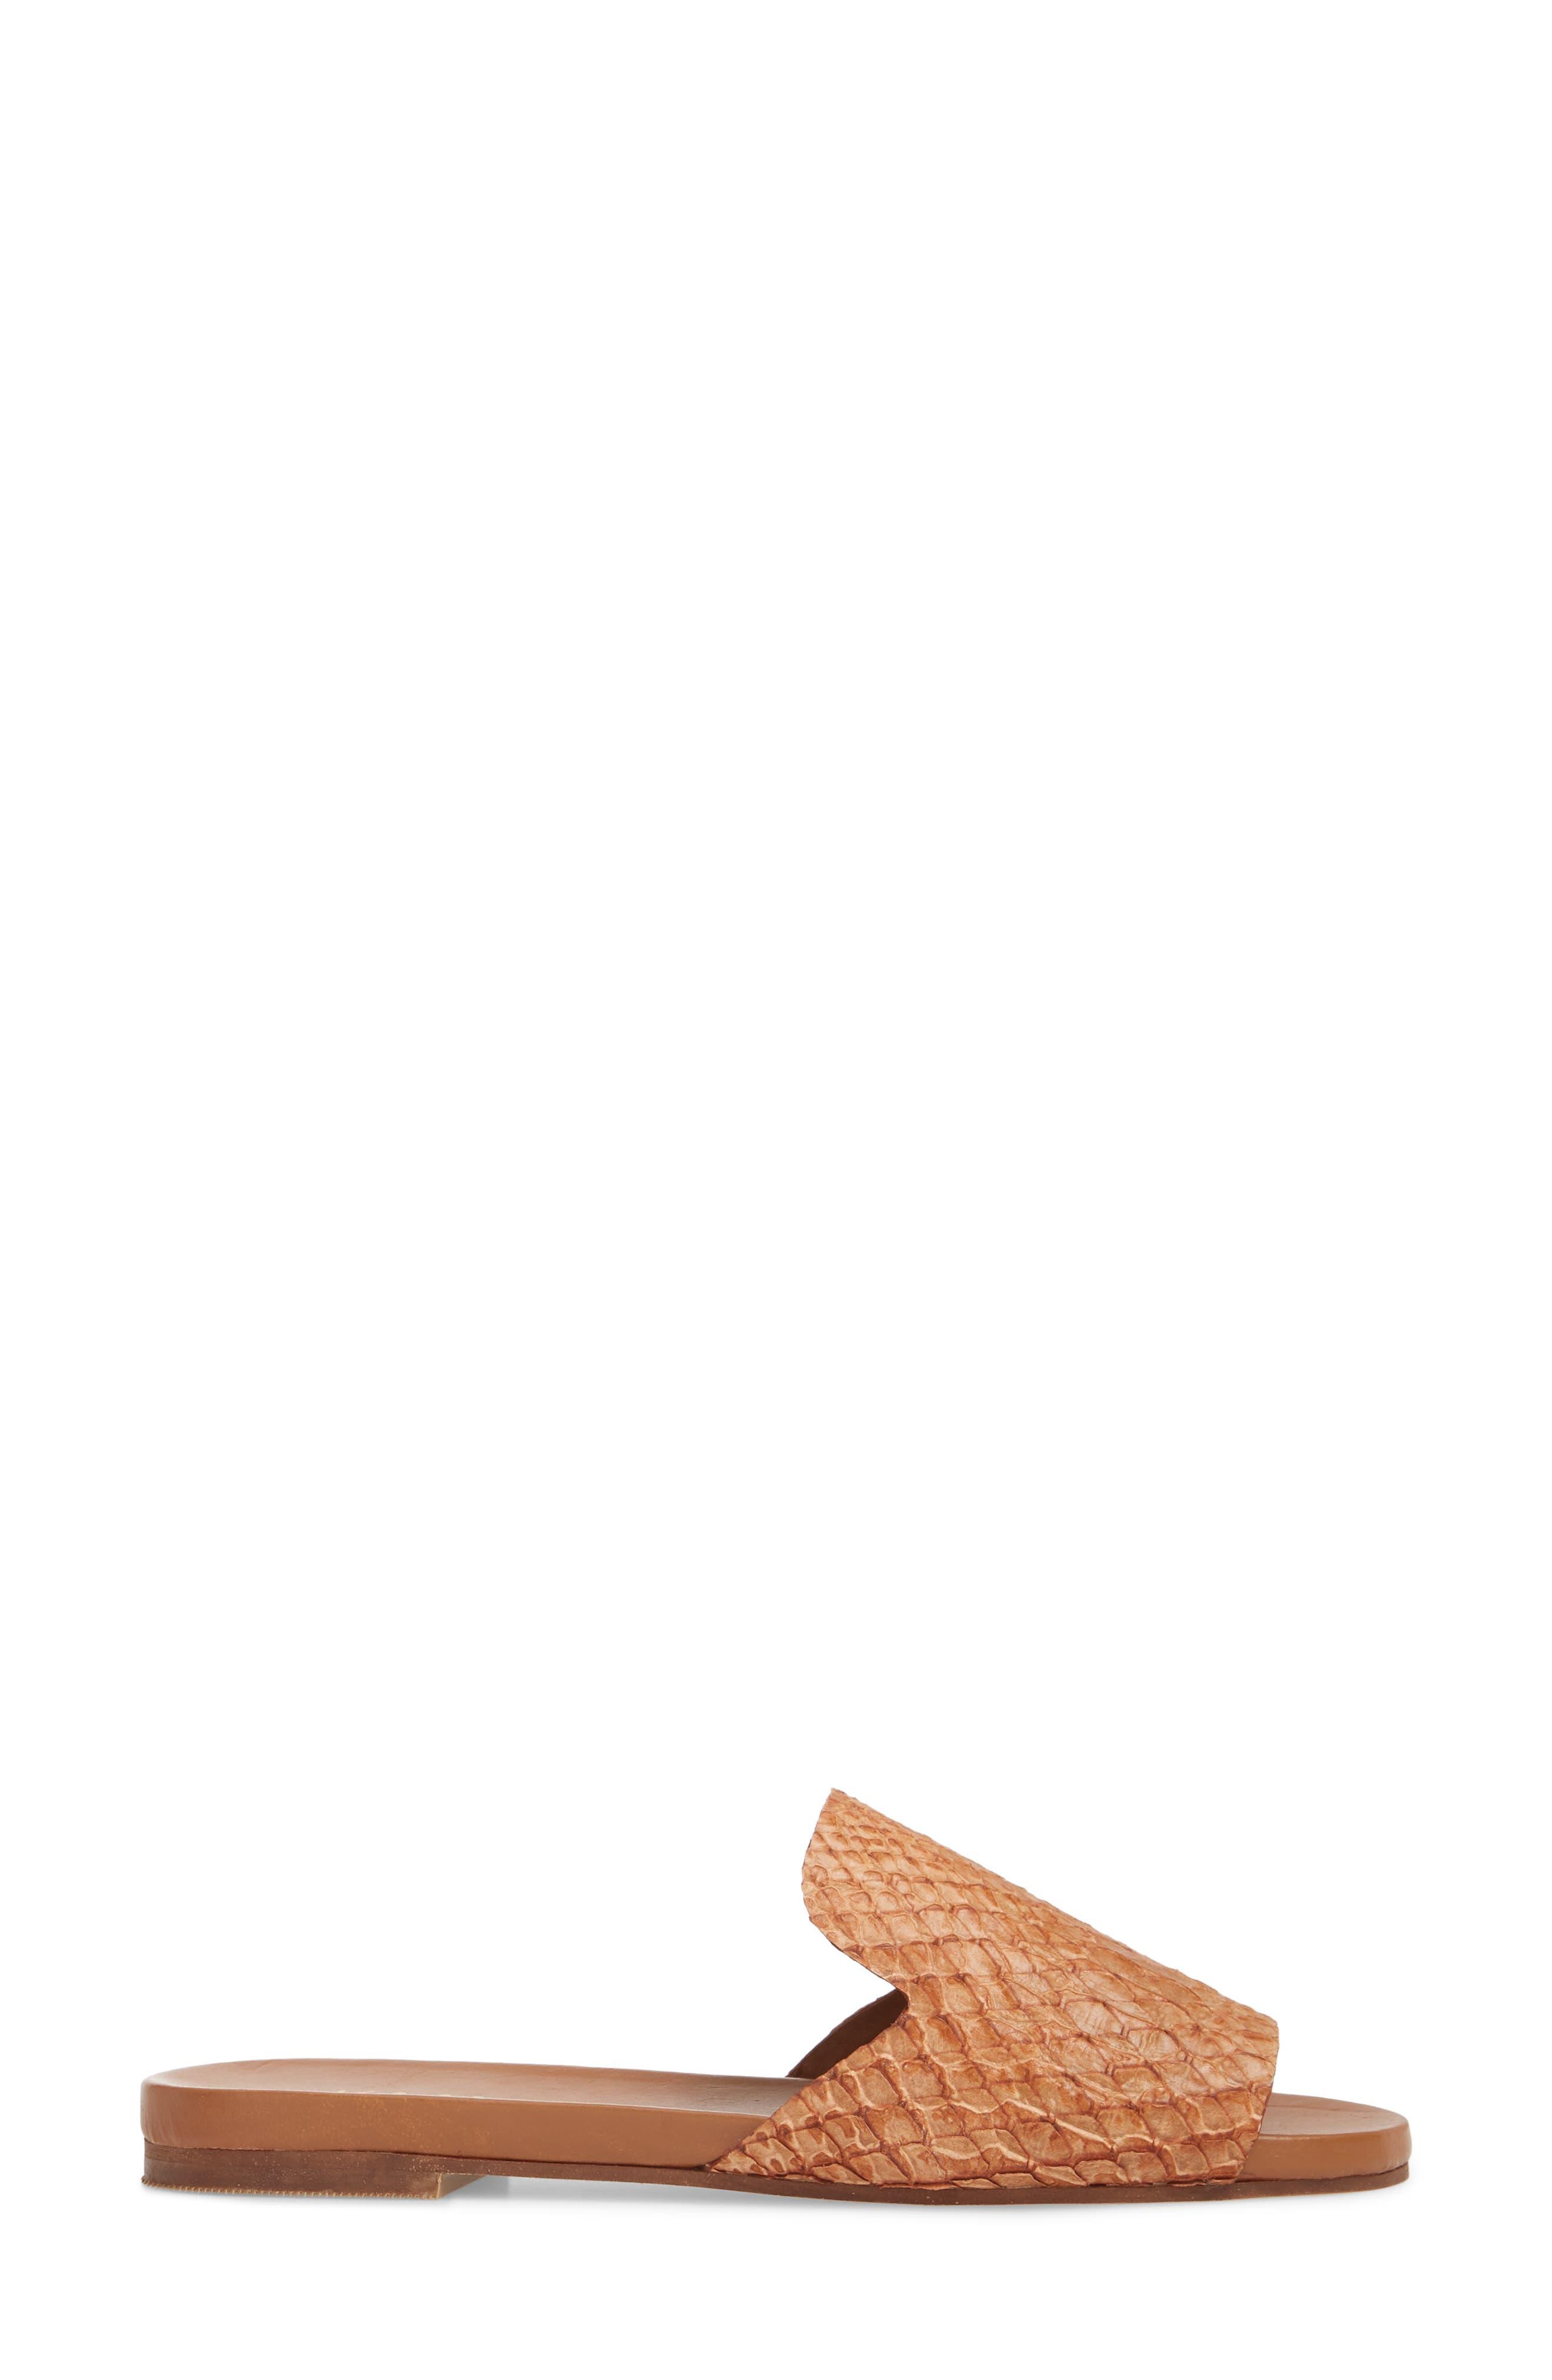 Leticia Loafer Mule Sandal,                             Alternate thumbnail 3, color,                             Honey